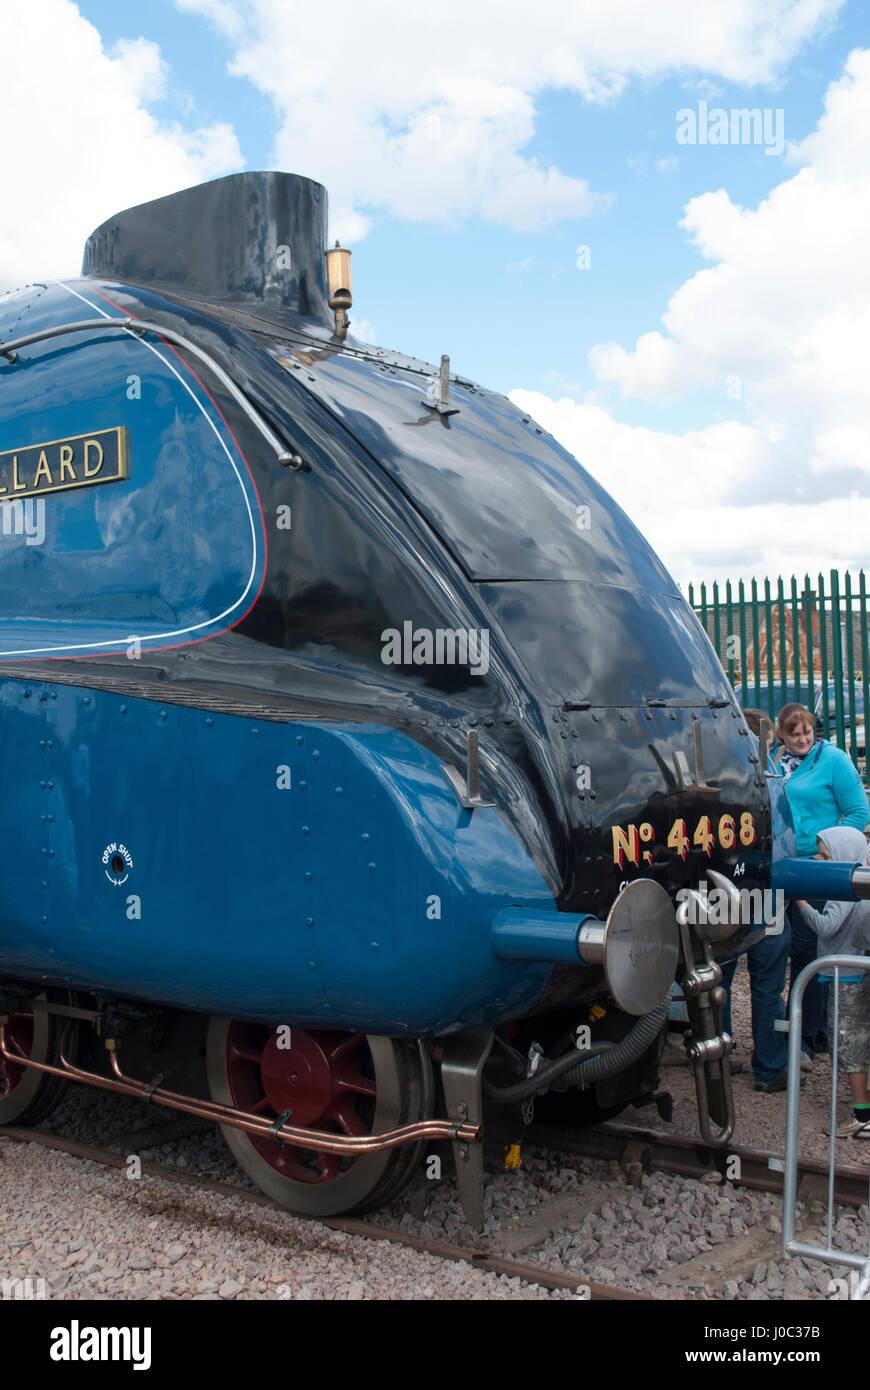 The front of the Mallard steam train - Stock Image